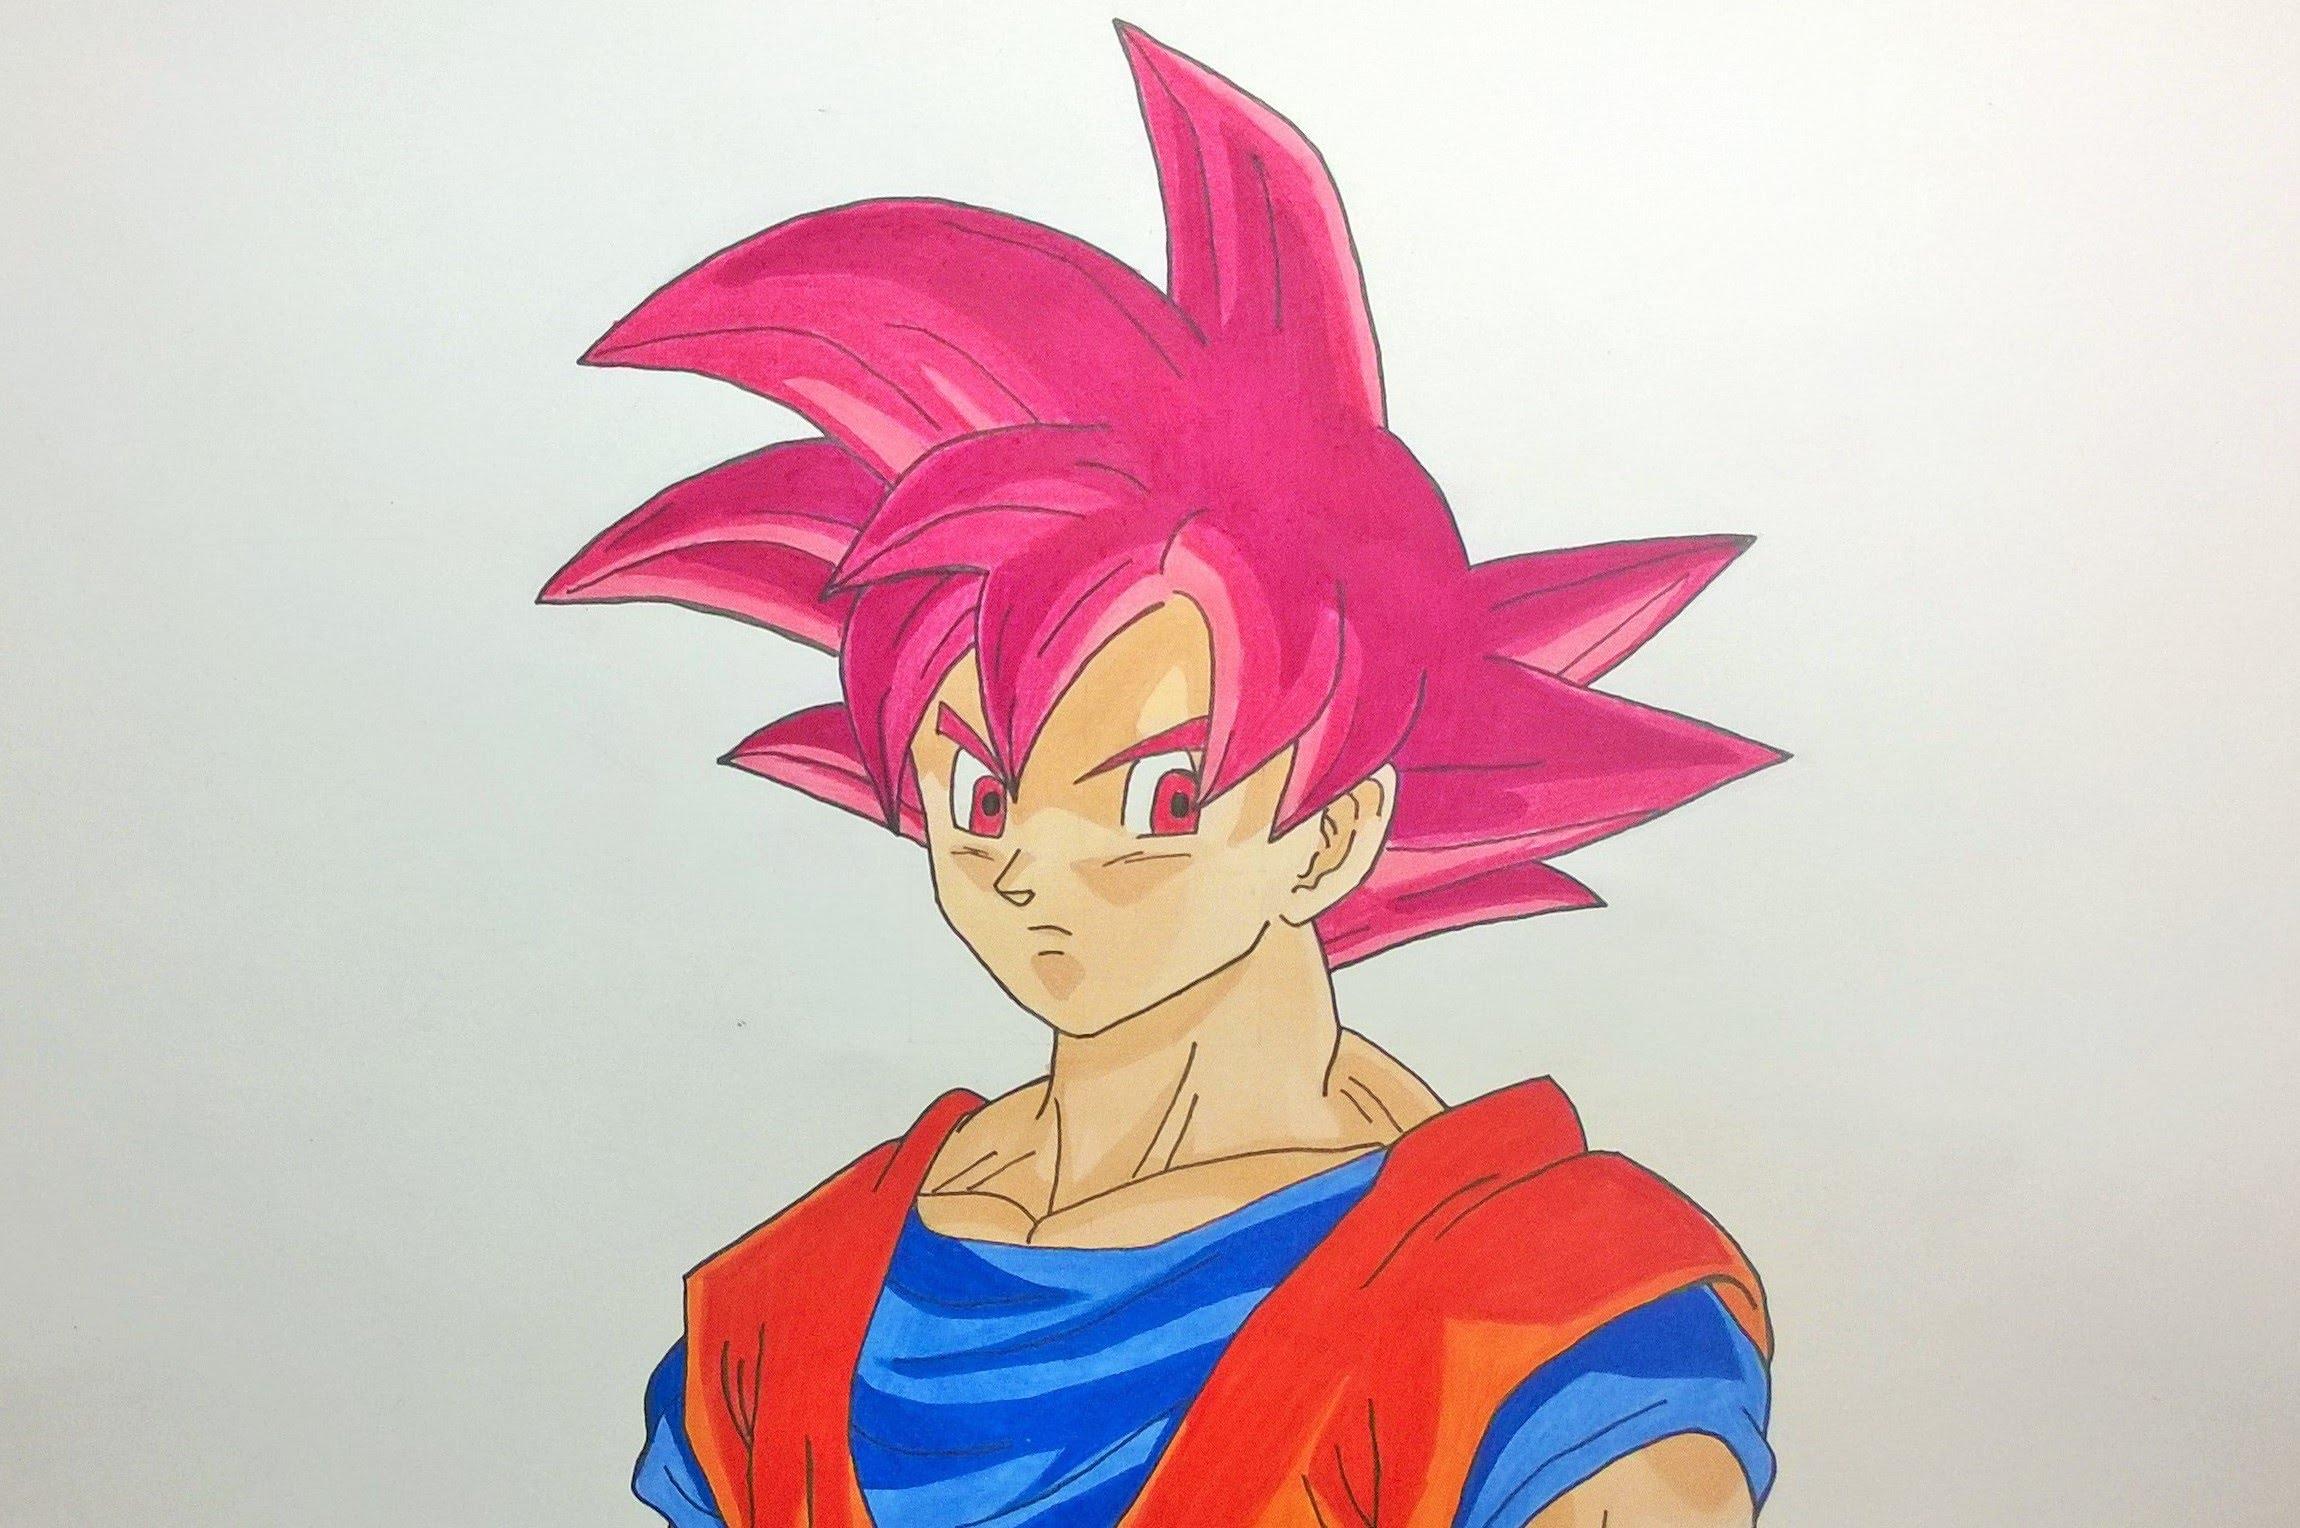 2300x1528 Dragon Ball Z Super Saiyan God Images Sketch Drawing Goku Super